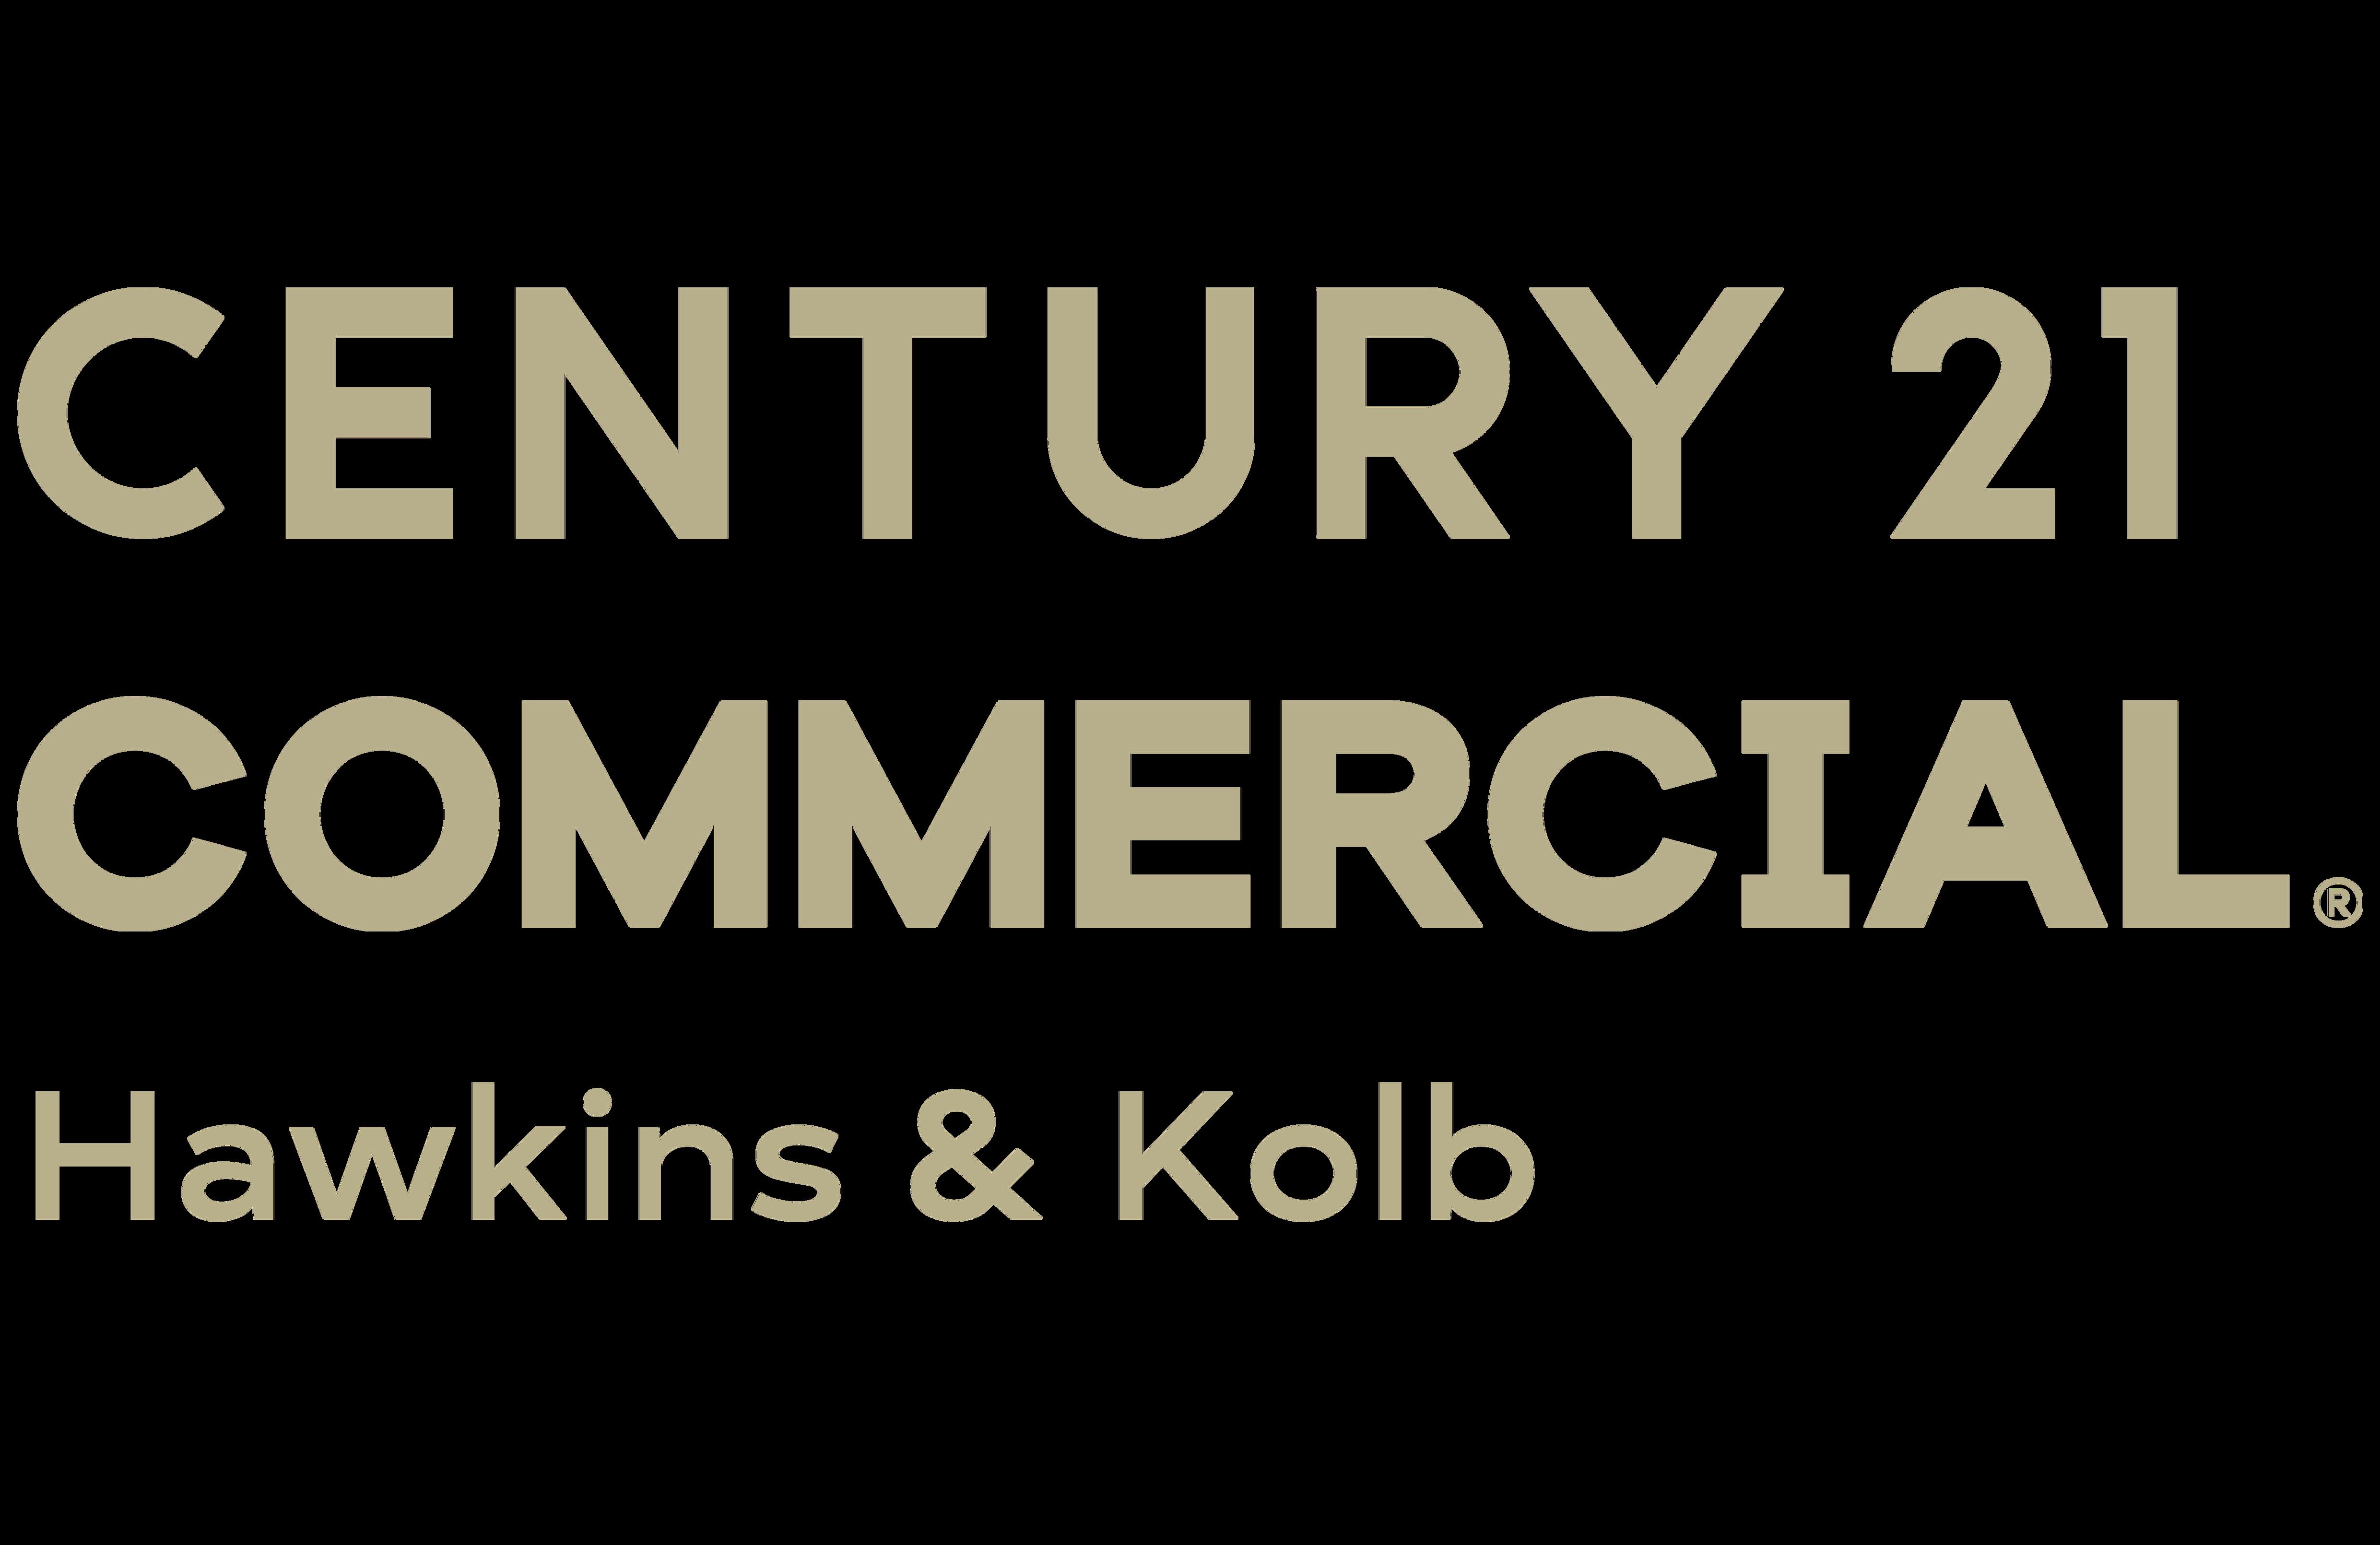 CENTURY 21 Hawkins & Kolb